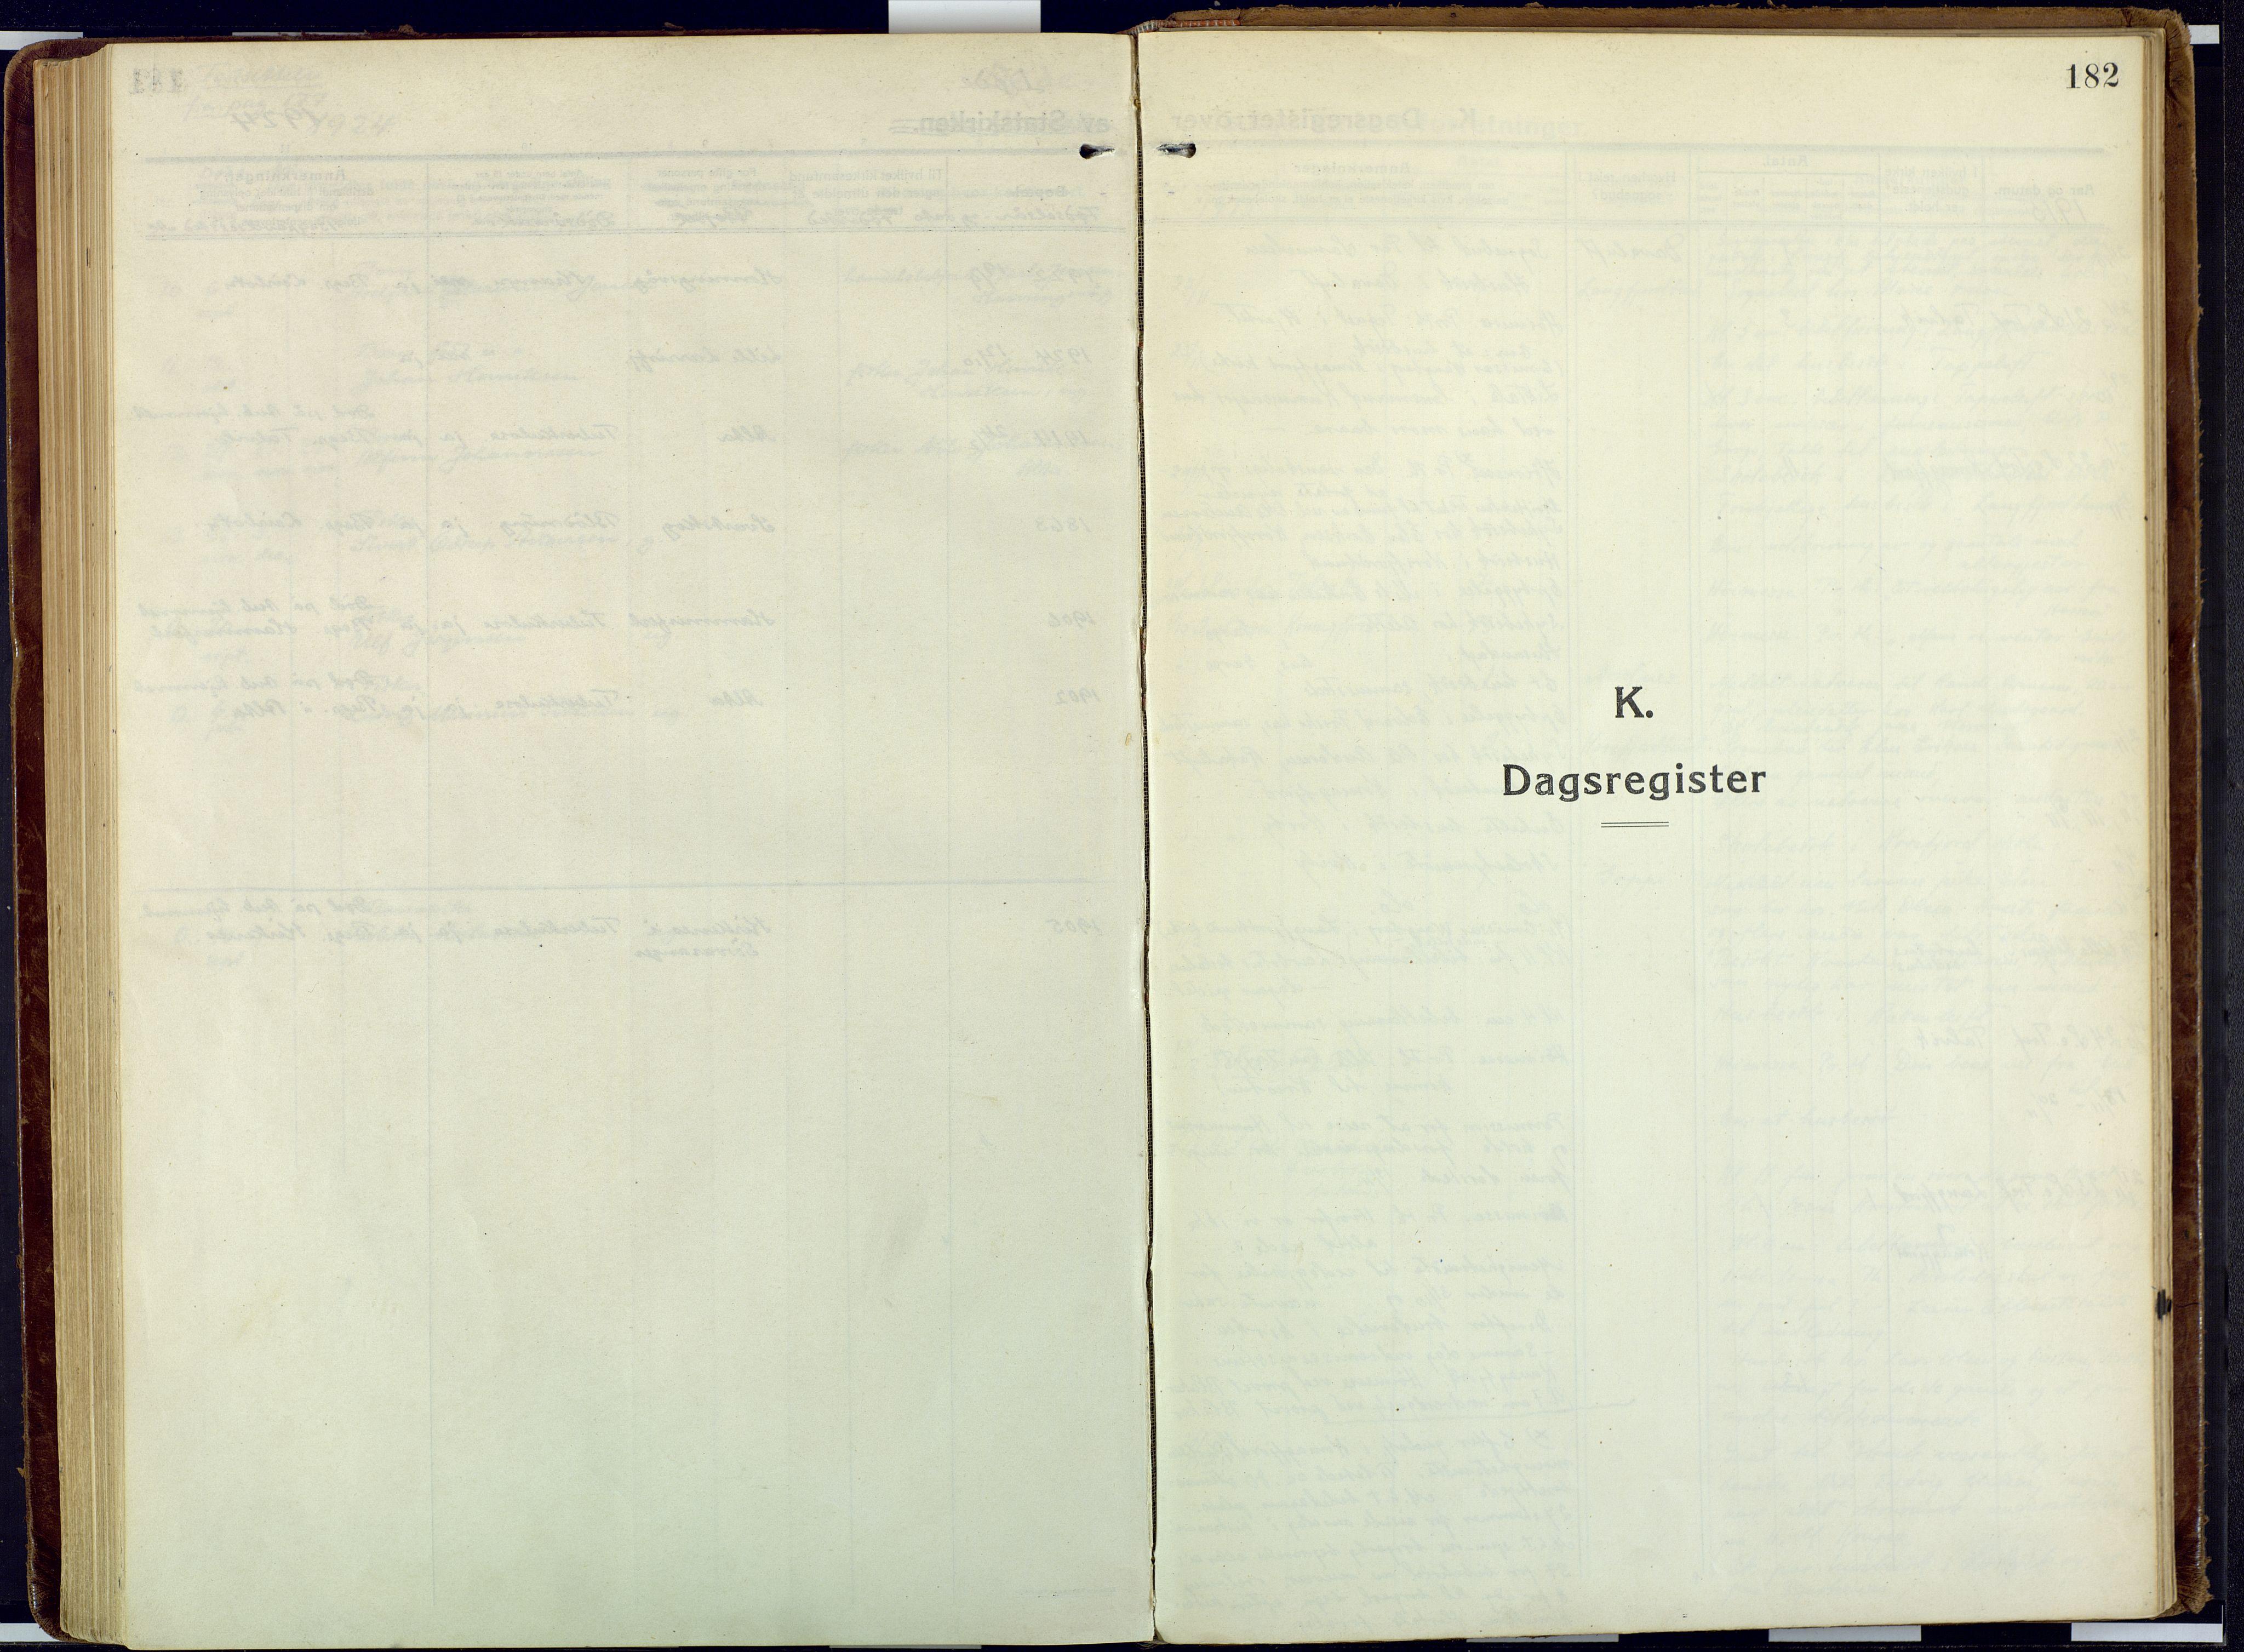 SATØ, Talvik sokneprestkontor, H/Ha/L0018kirke: Ministerialbok nr. 18, 1915-1924, s. 182